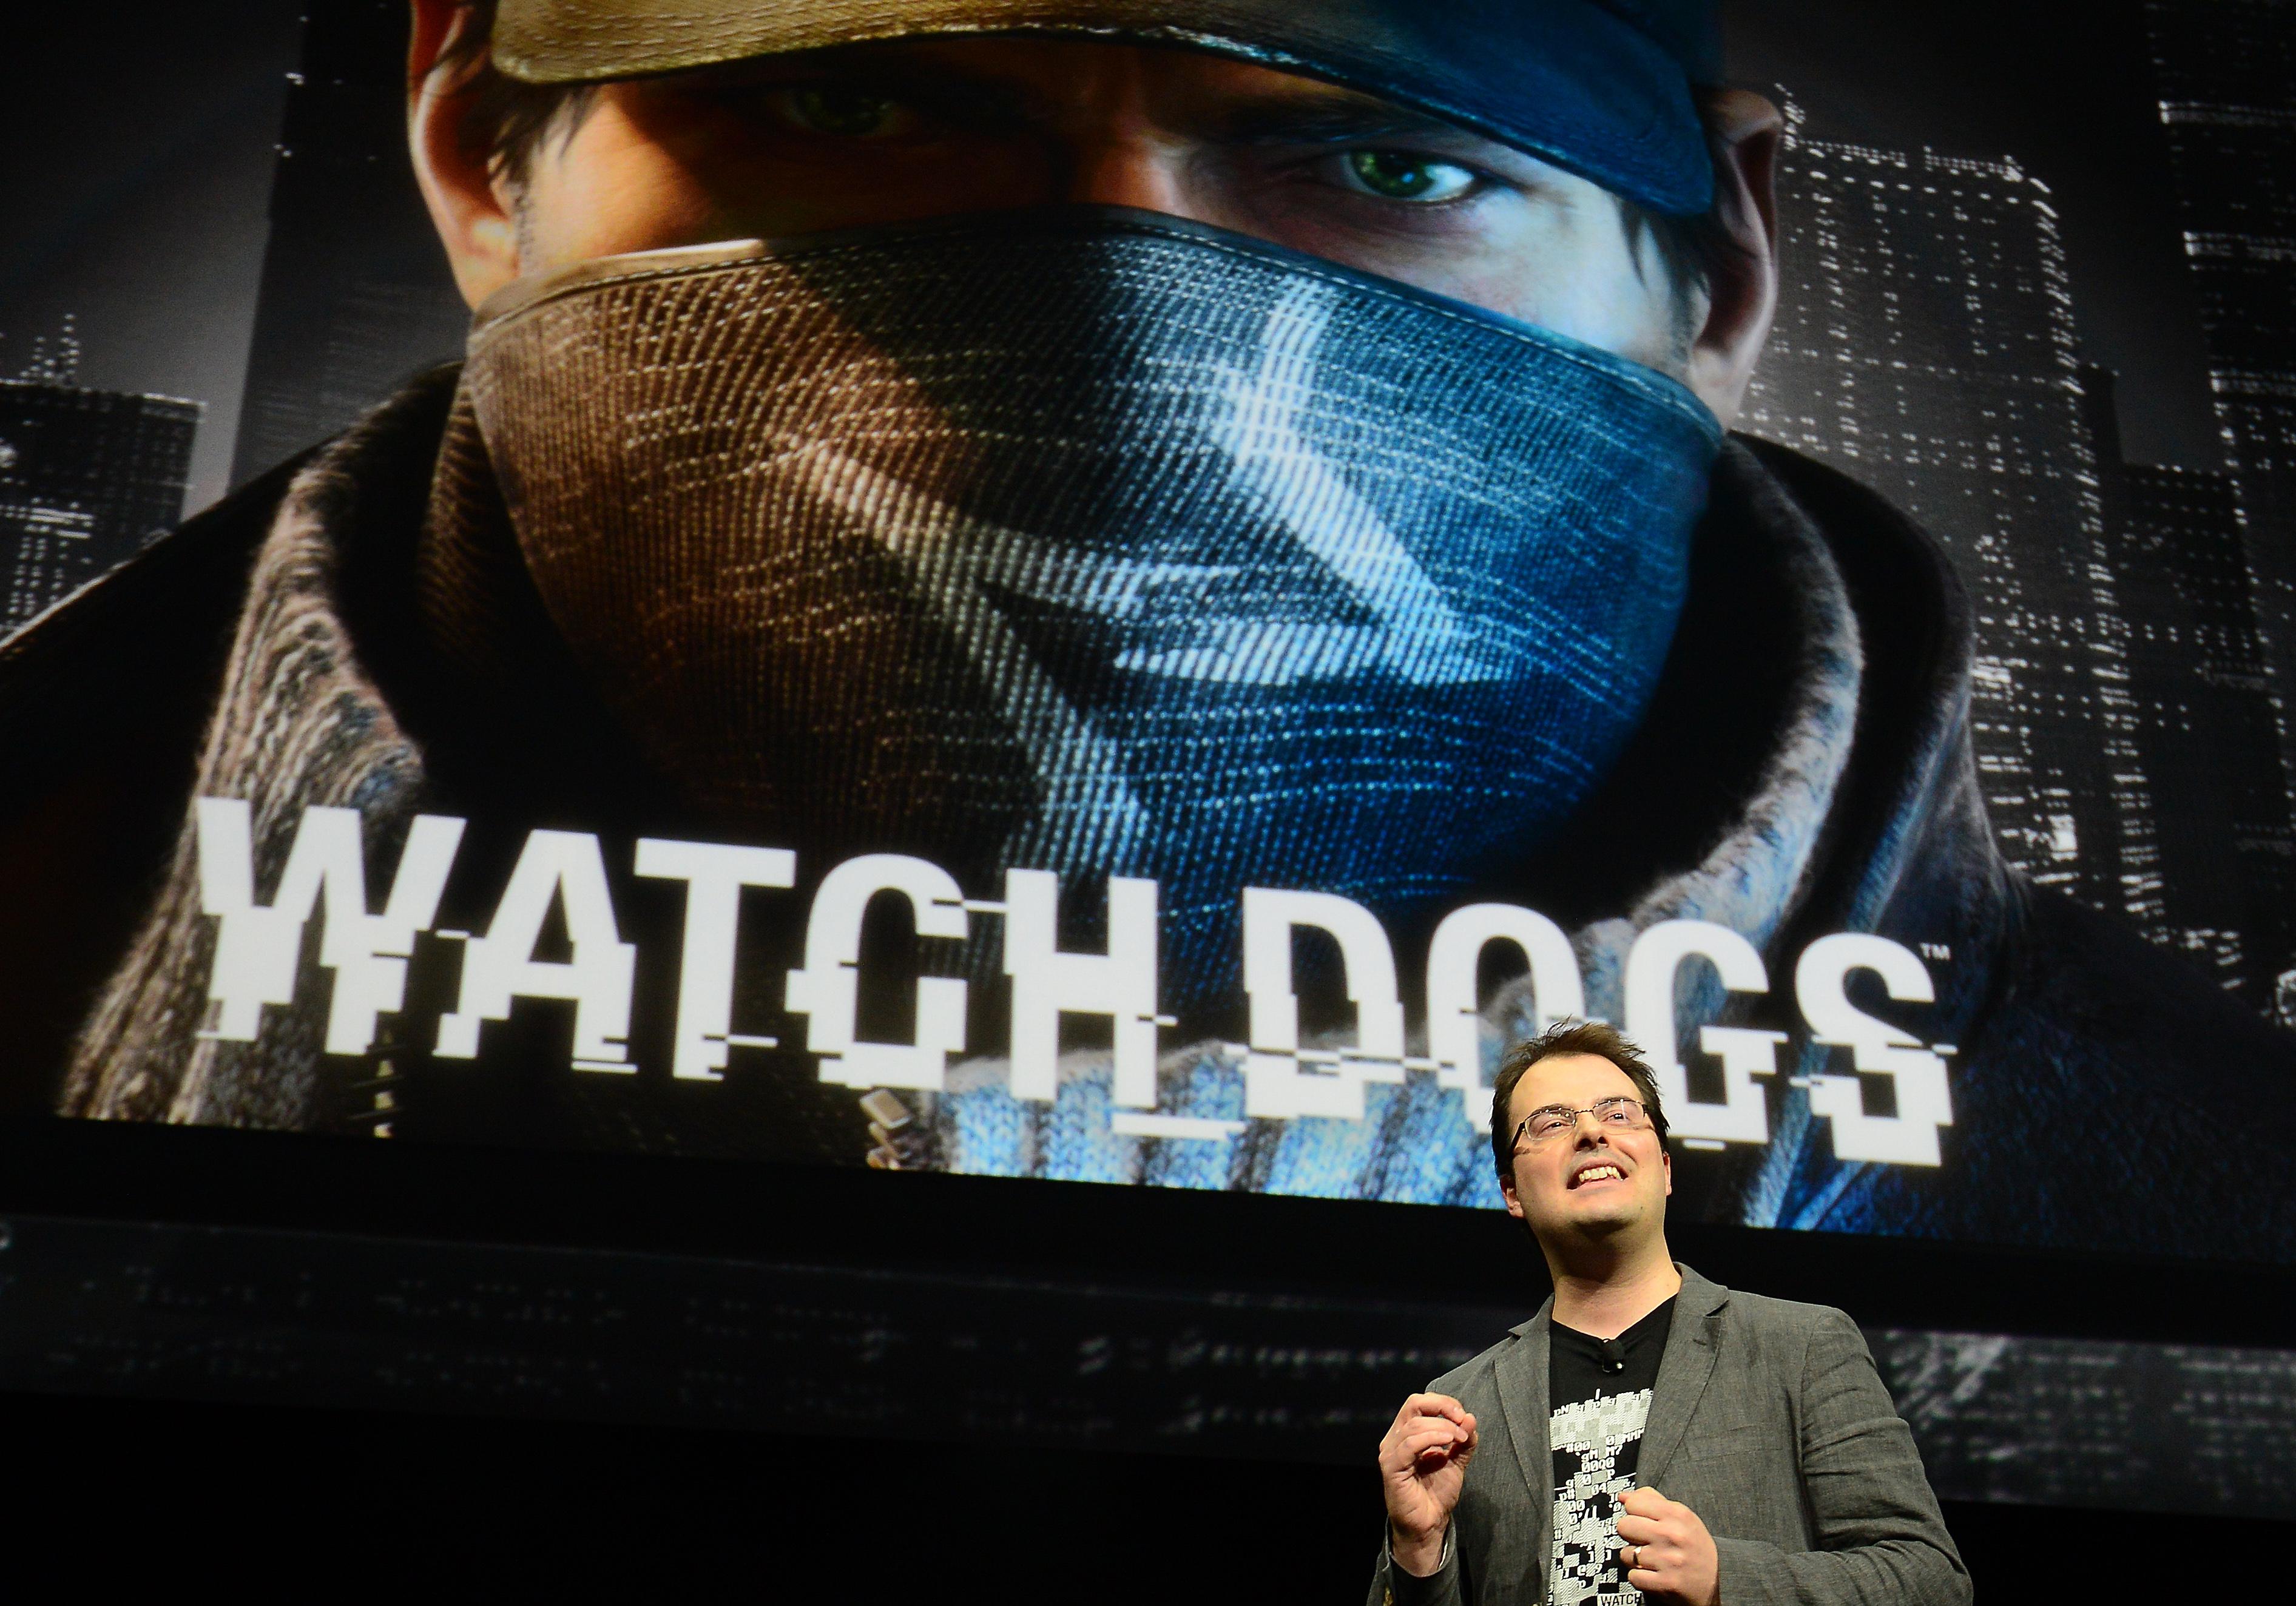 Watch Dogs Wii U-Version: Release-Termin erneut verschoben